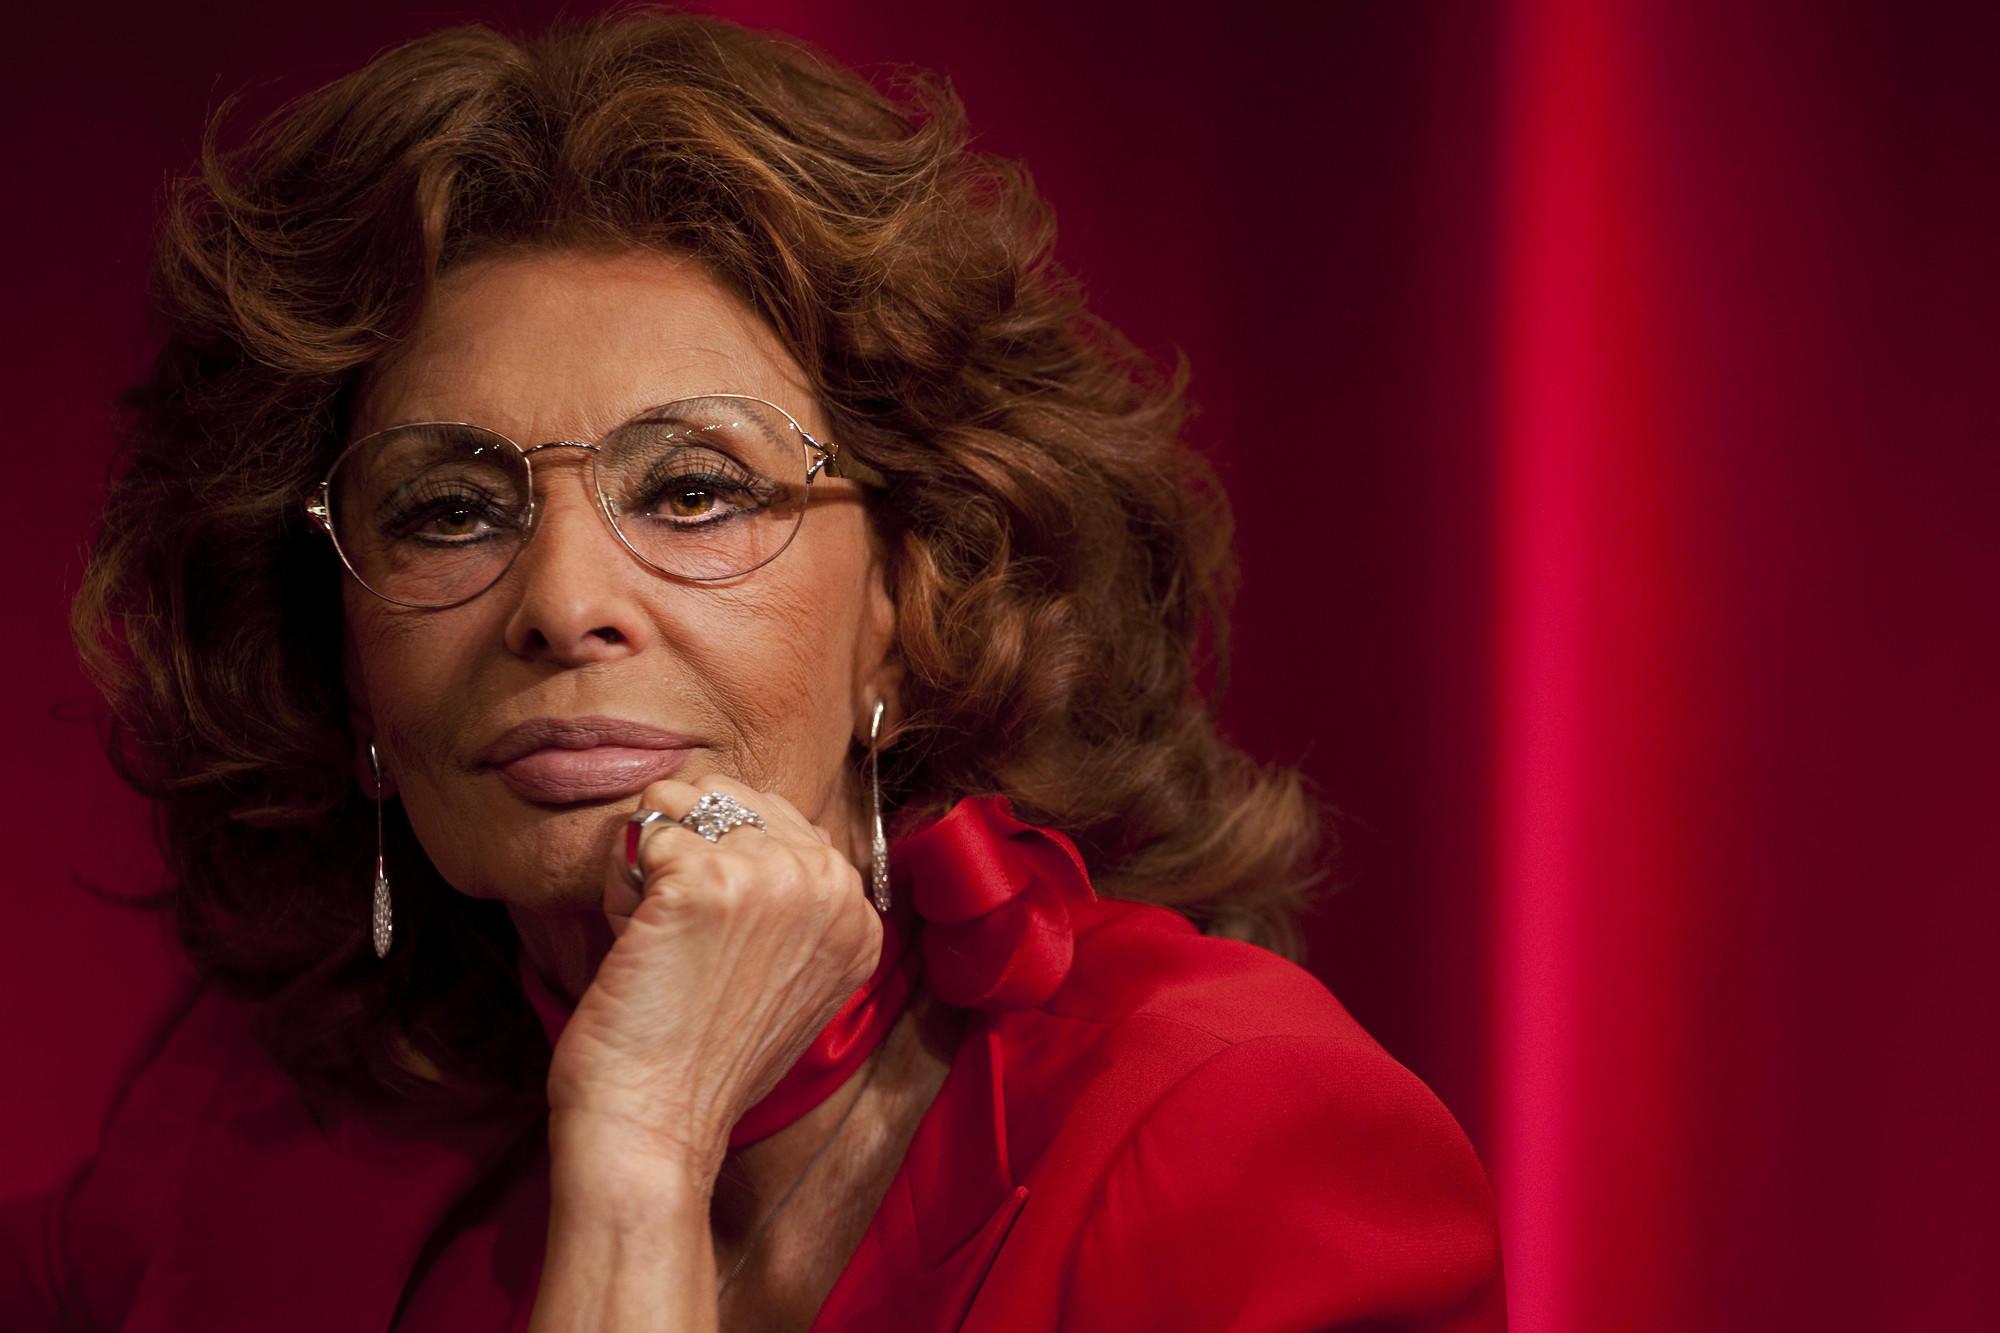 A Star Is Born: Sophia Loren turns 83 today